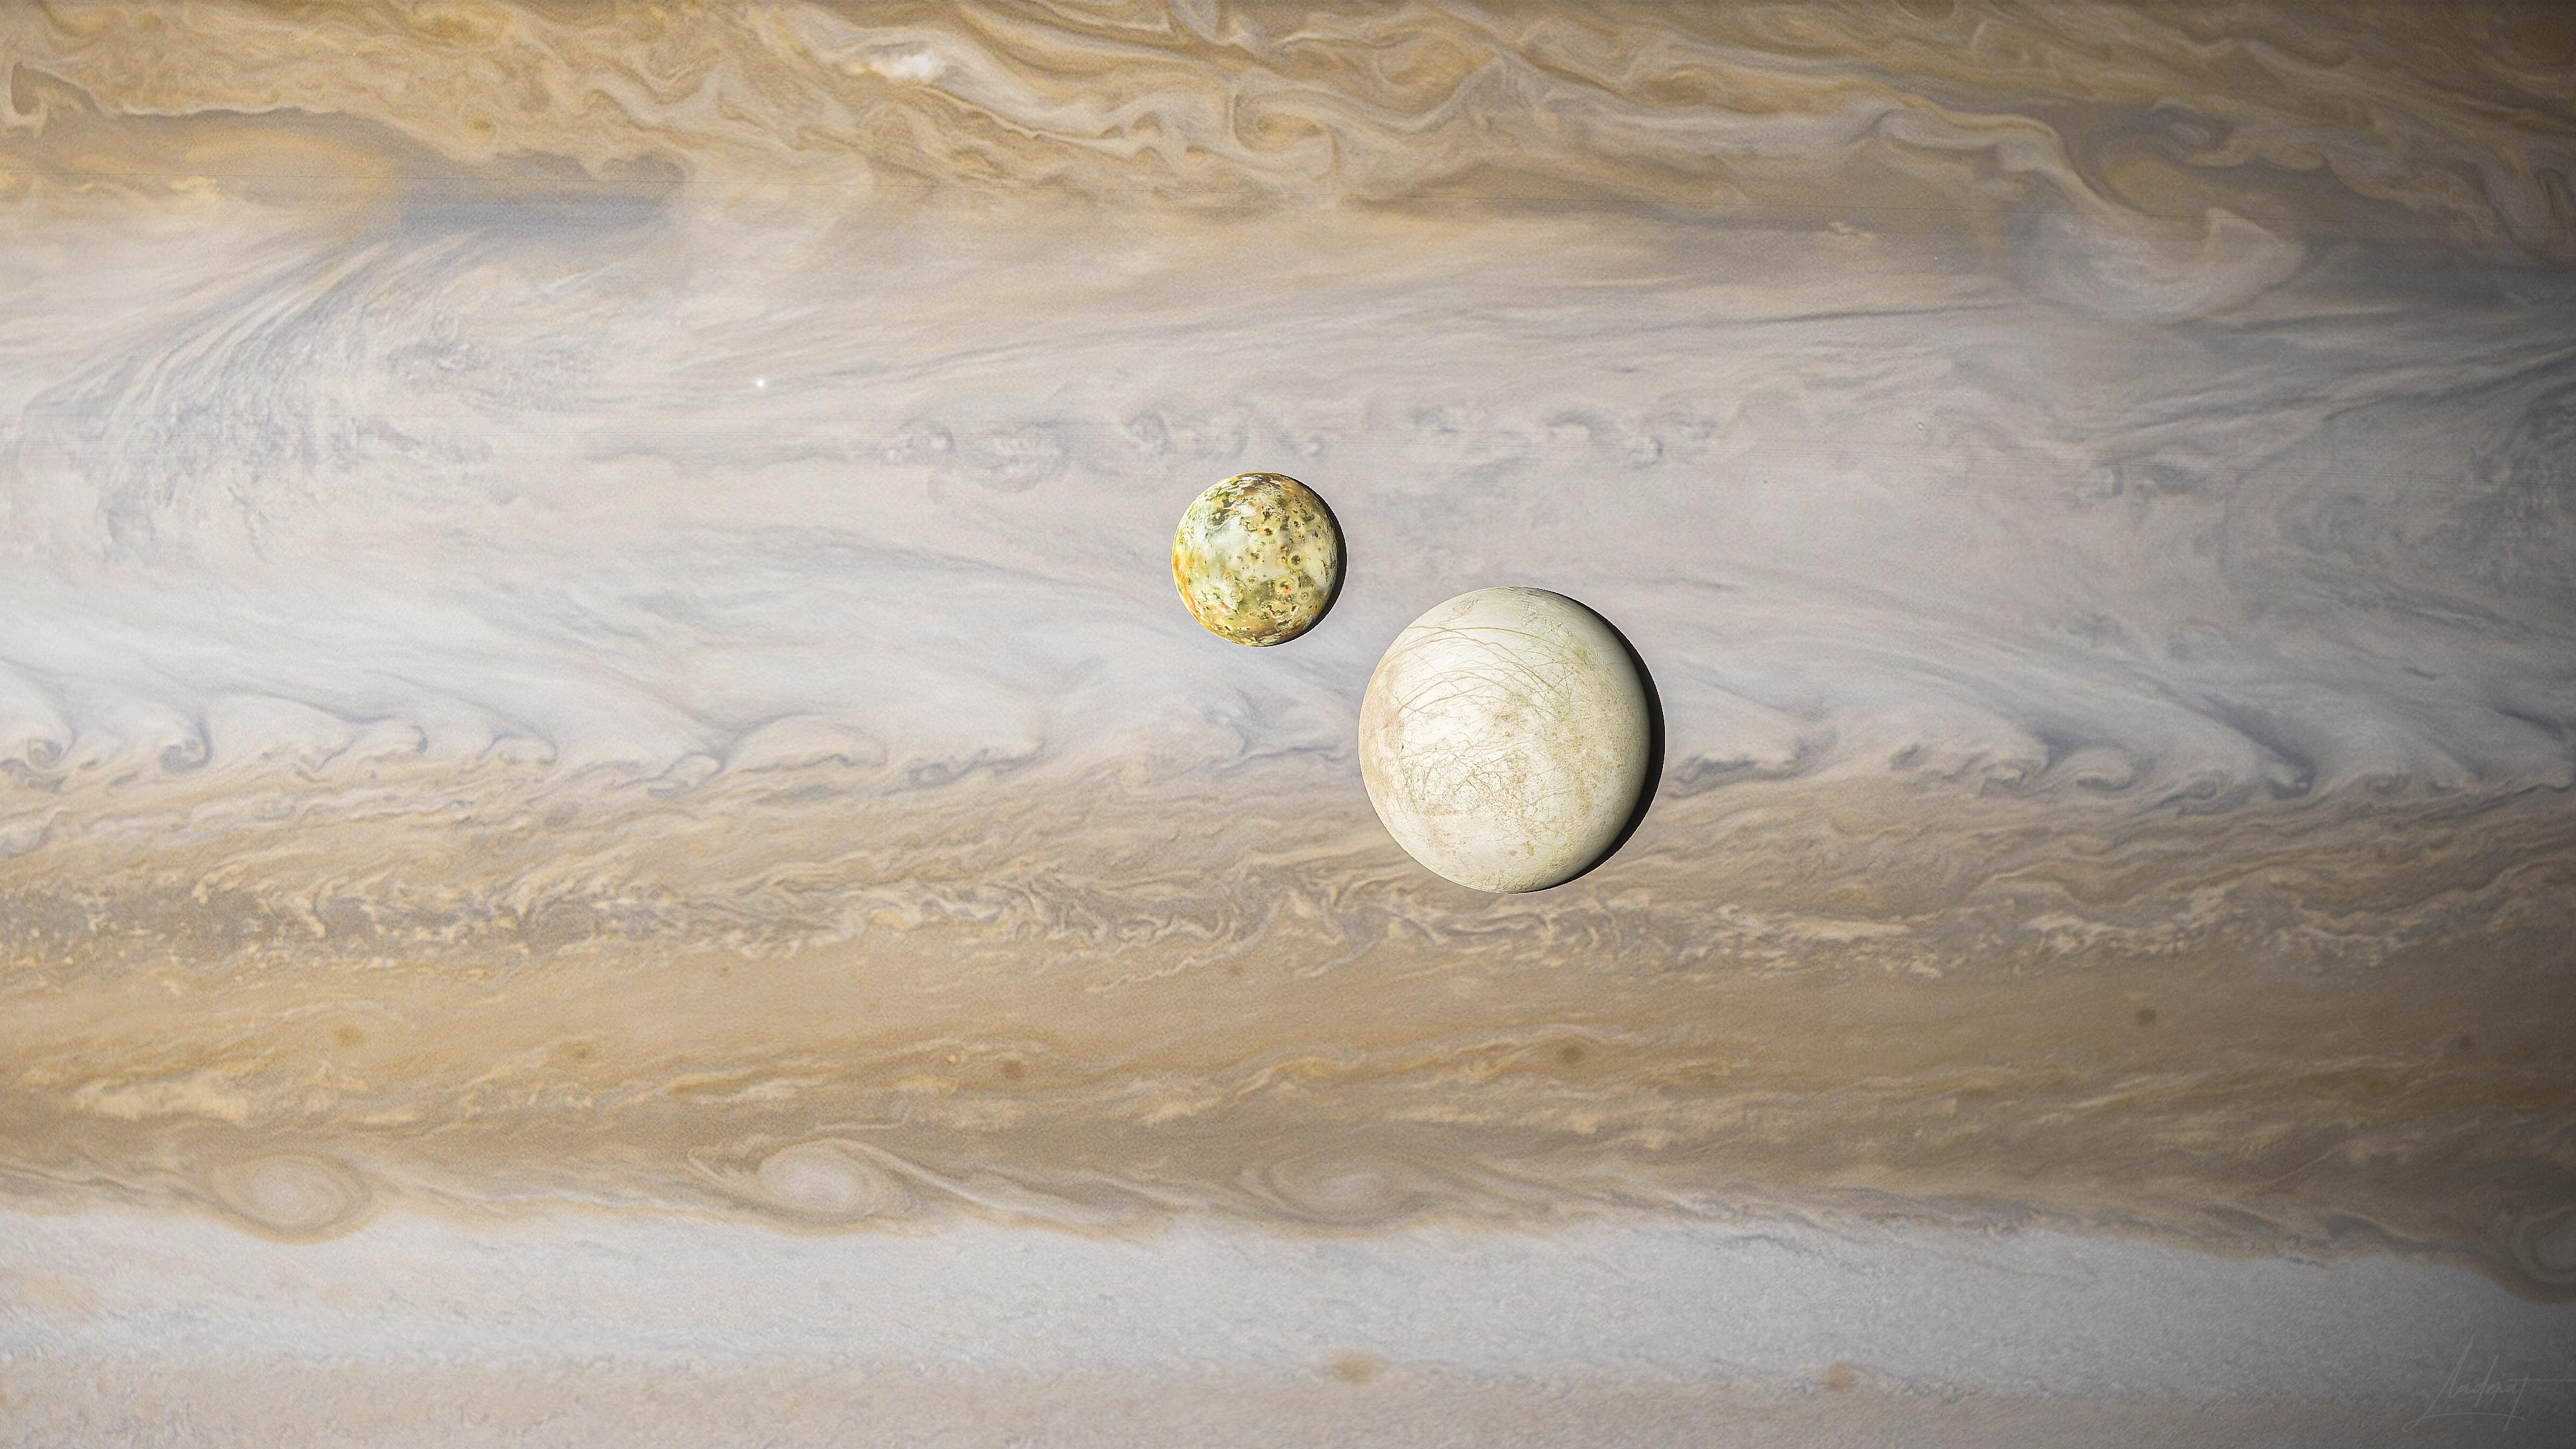 General 3840x2160 space Space Engine Jupiter